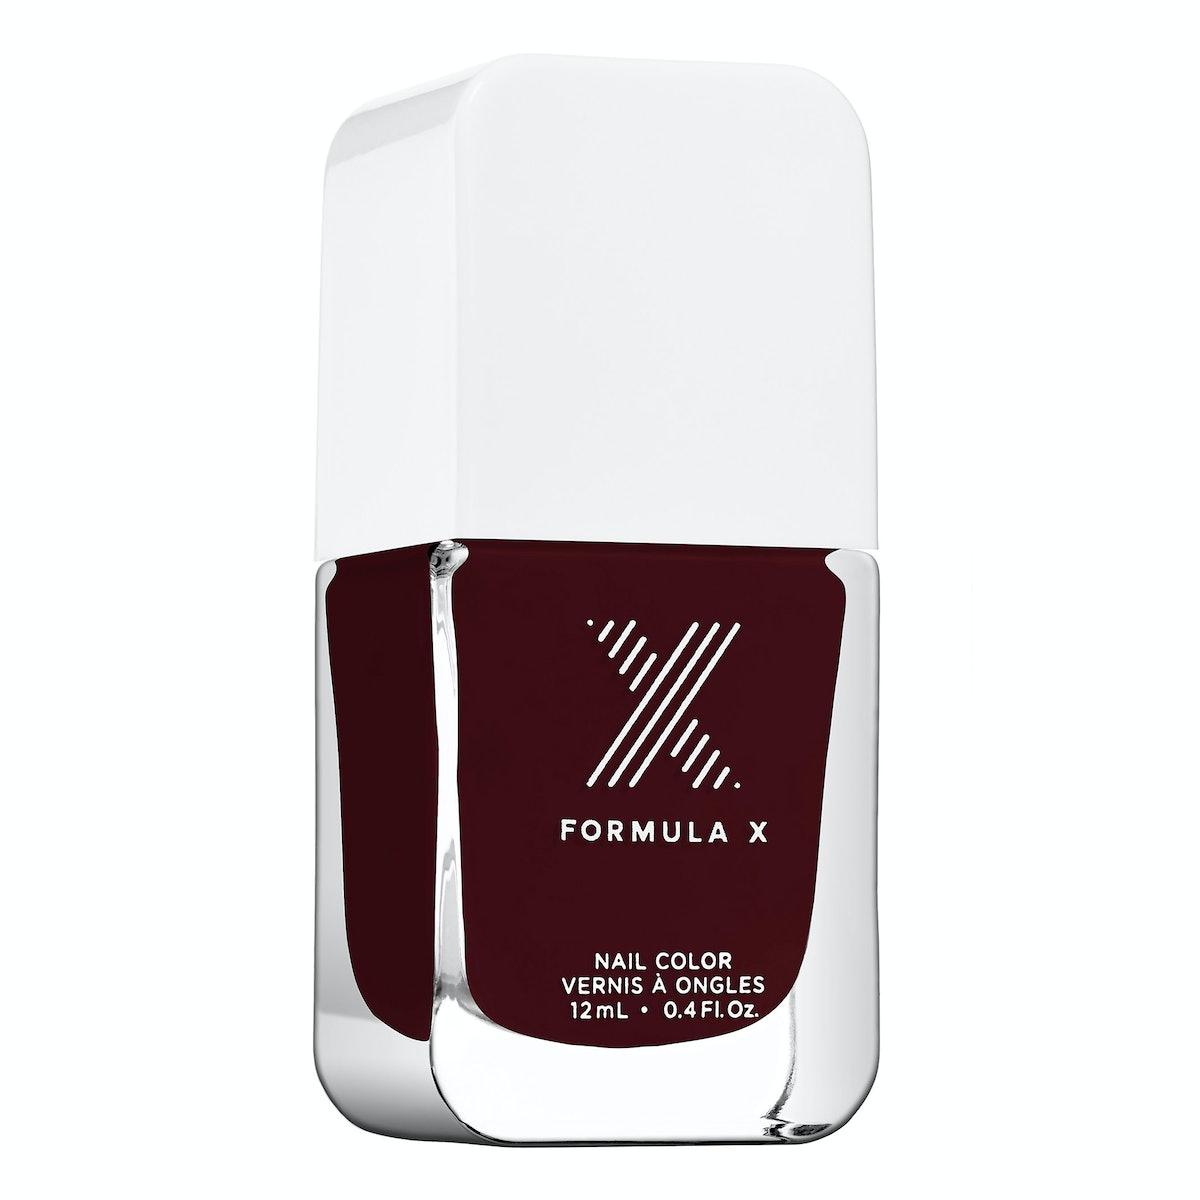 Formula X nail polish in Ignite